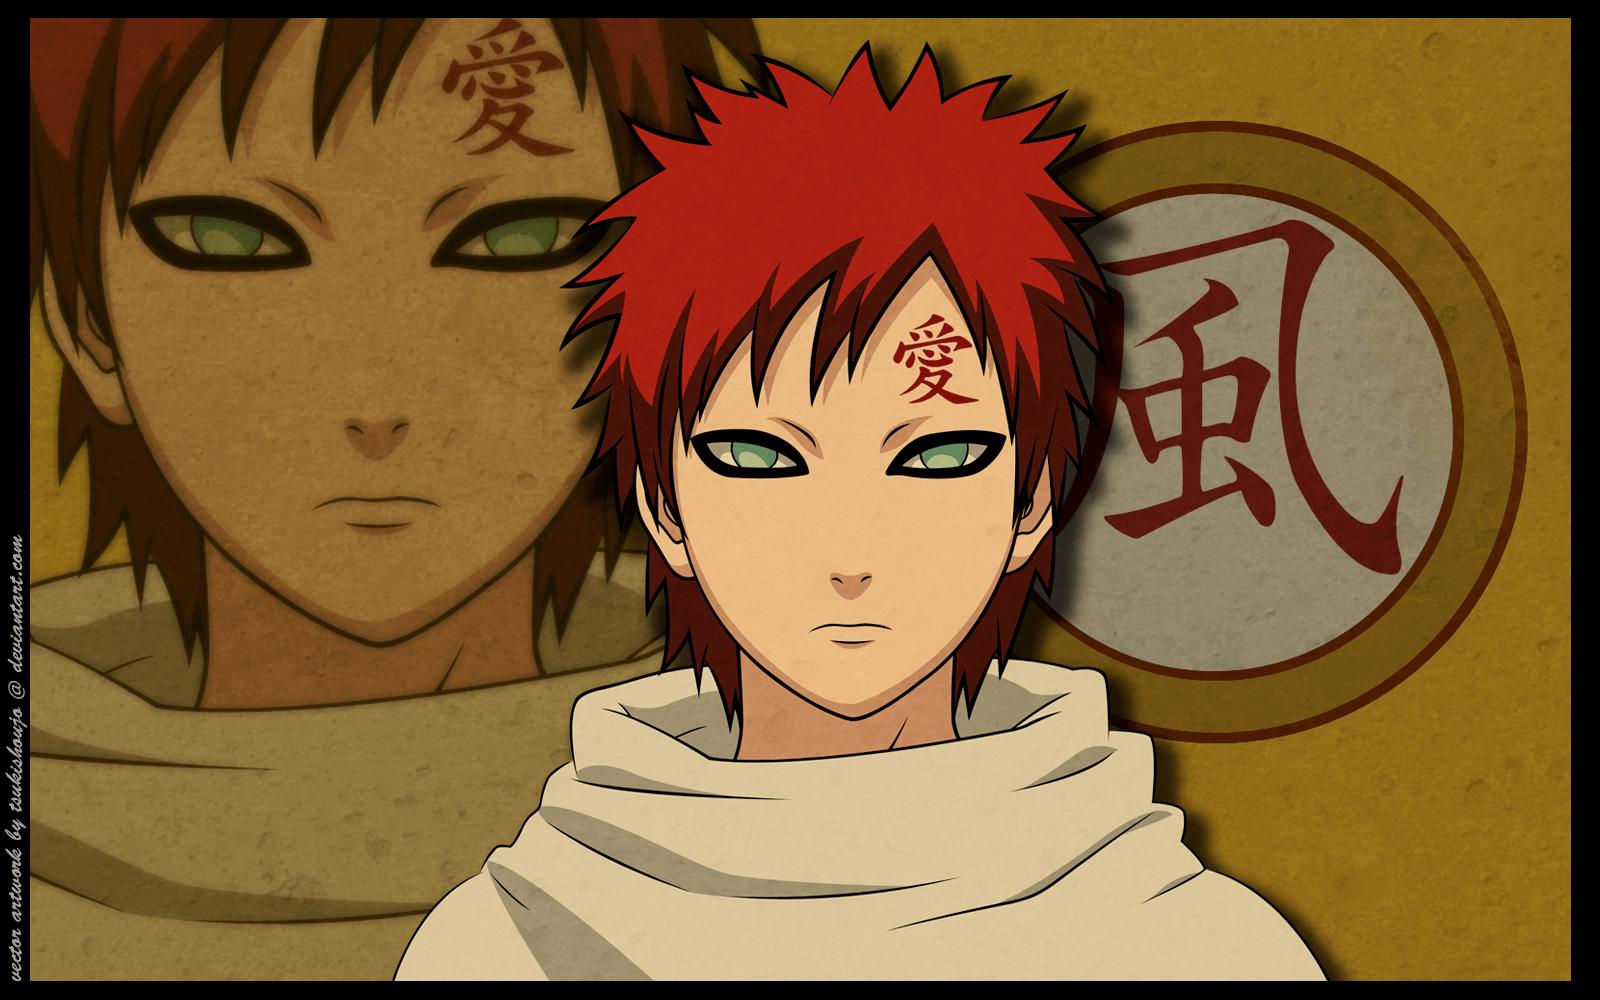 Gaara Kazekage   Naruto Wallpaper (28974620)   Fanpop